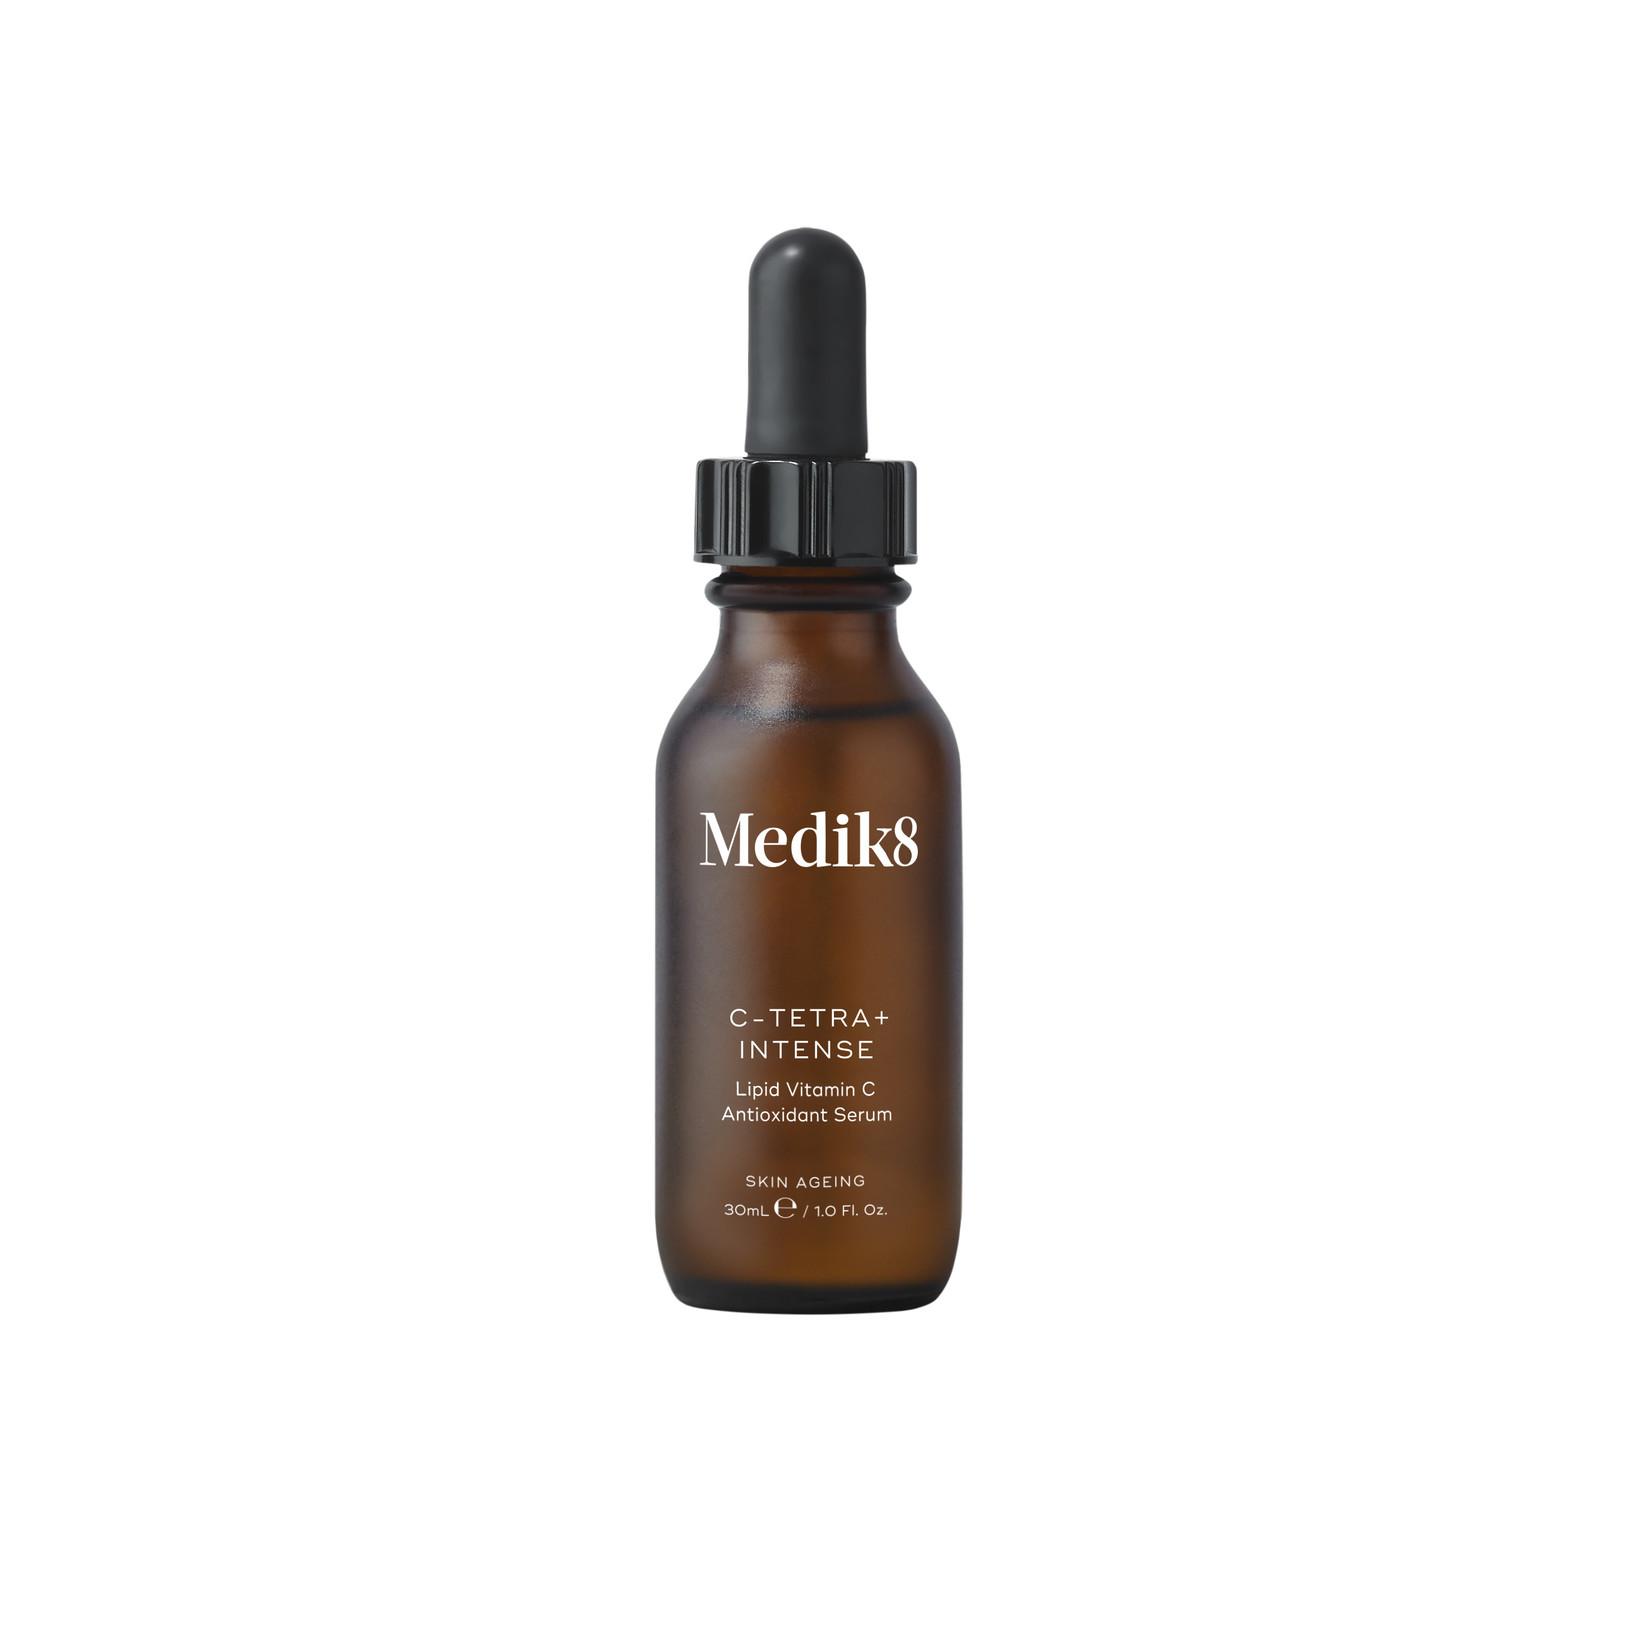 Medik8 Medik8 Try me Size: C-Tetra Intense (8 ml)